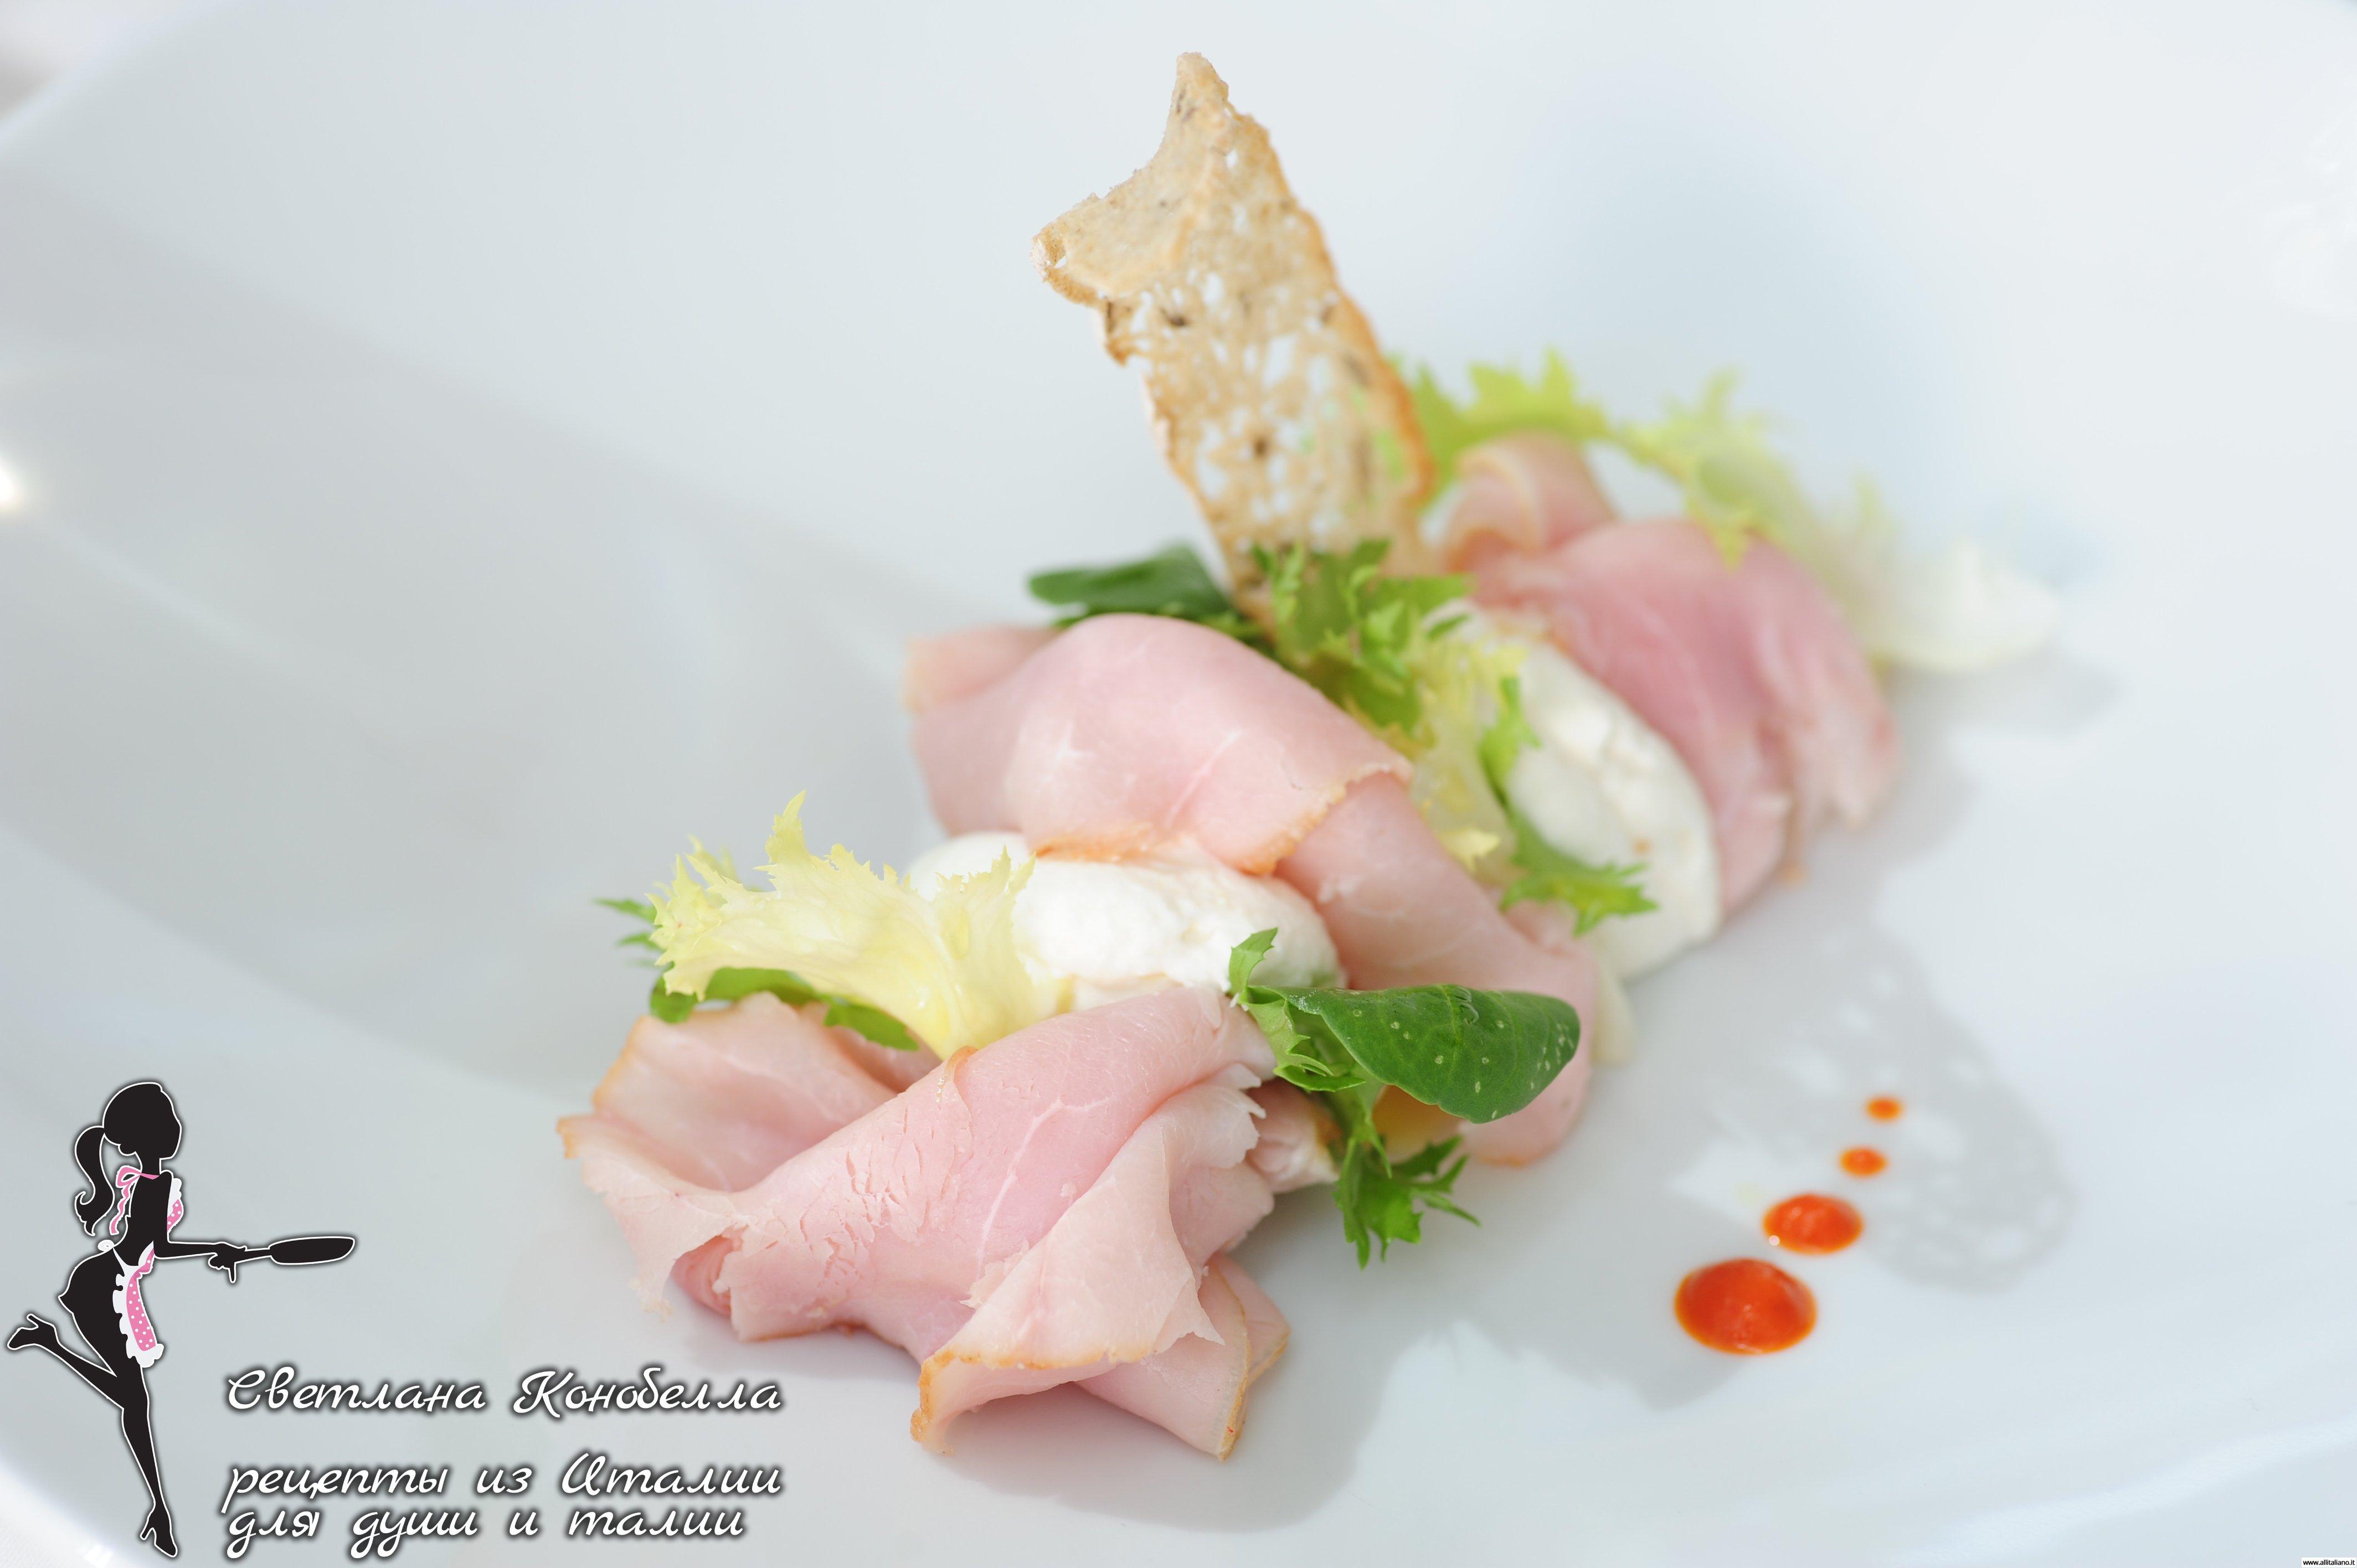 chef-povar-shef-povar-rezepty-italianskoj-kuhni-martin-kiem-svetlana-konobella-italia-alto-adige (2)